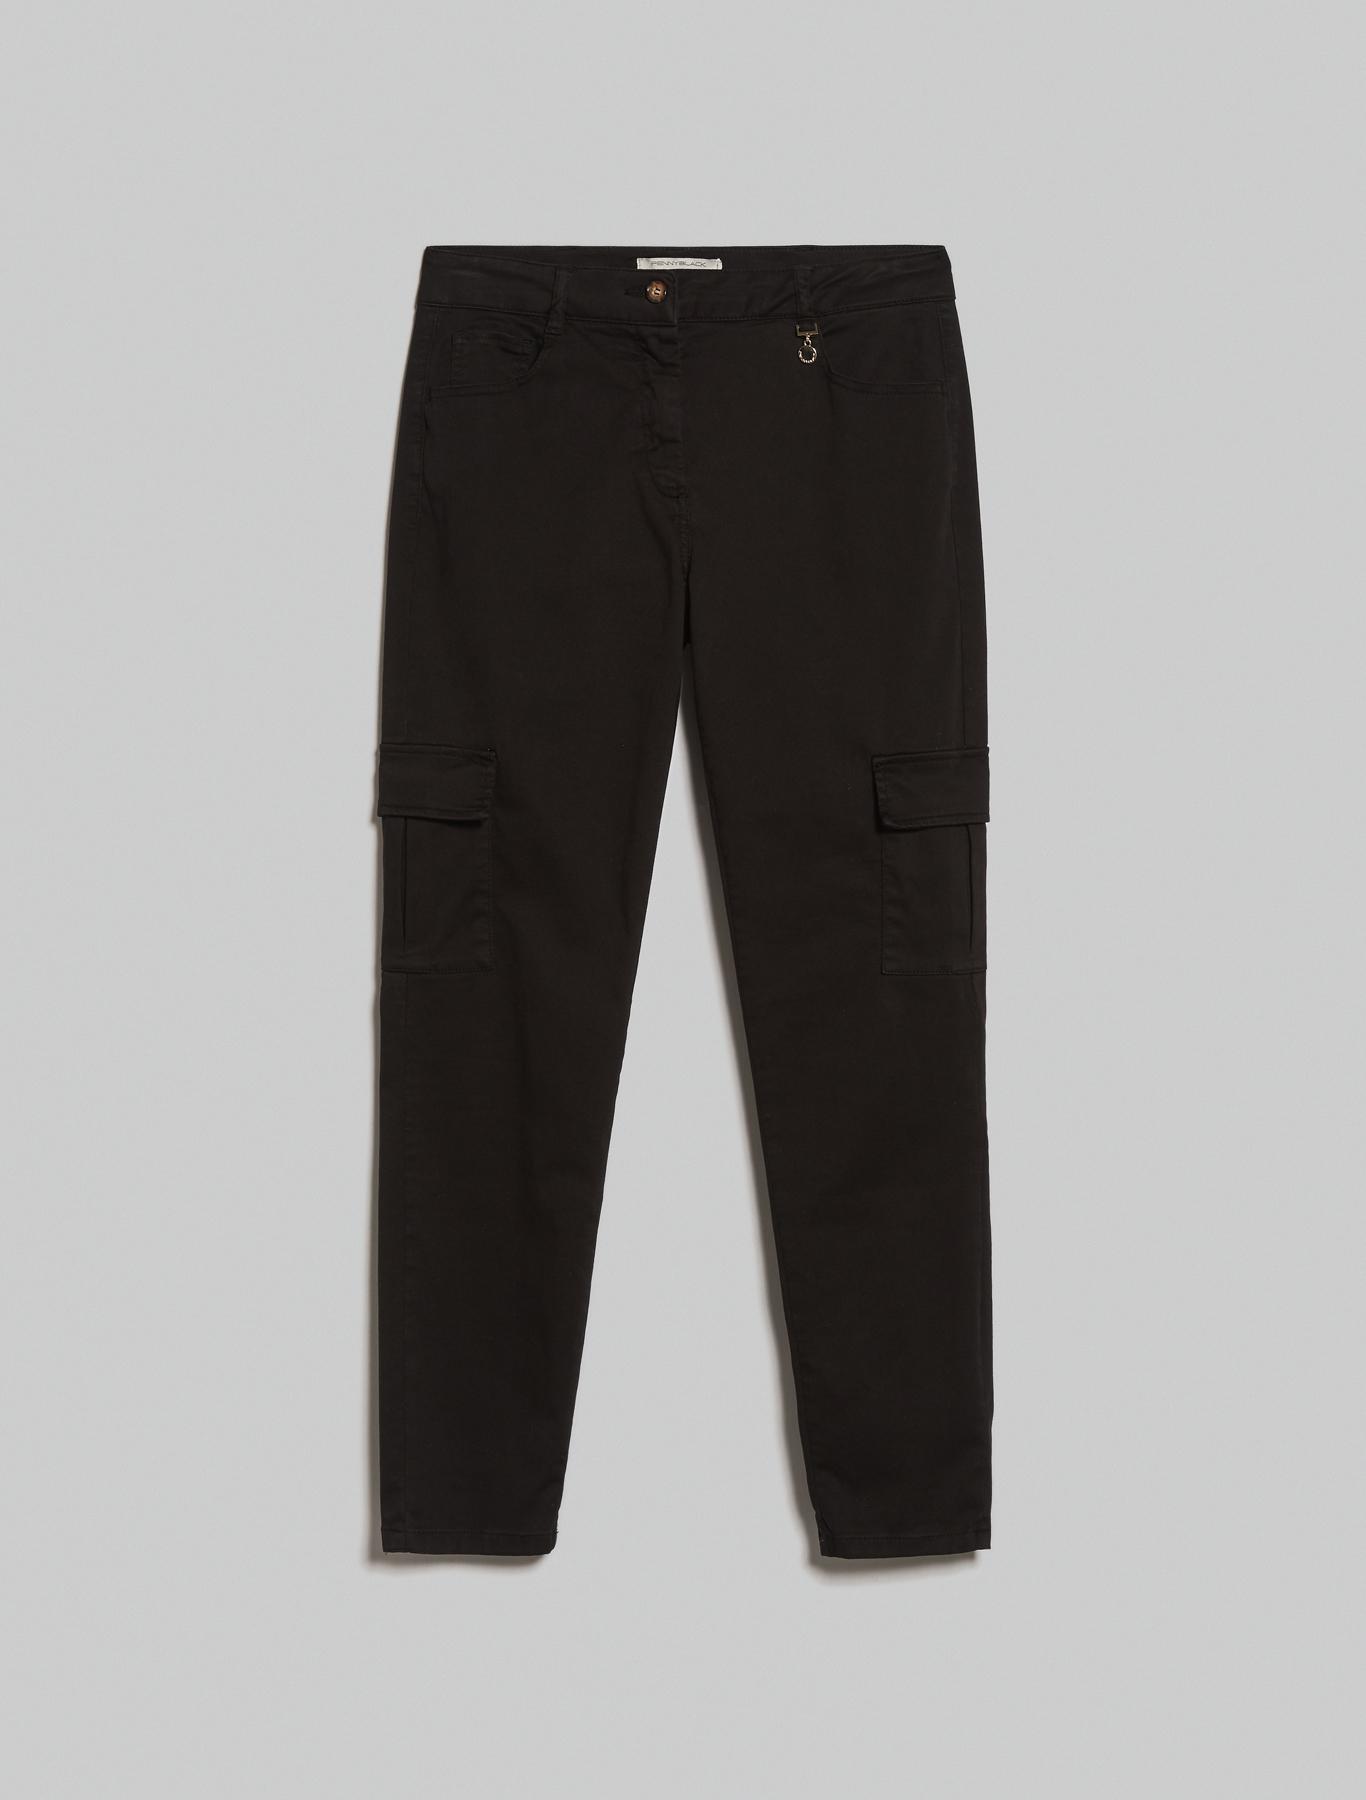 Skinny cargo trousers - black - pennyblack